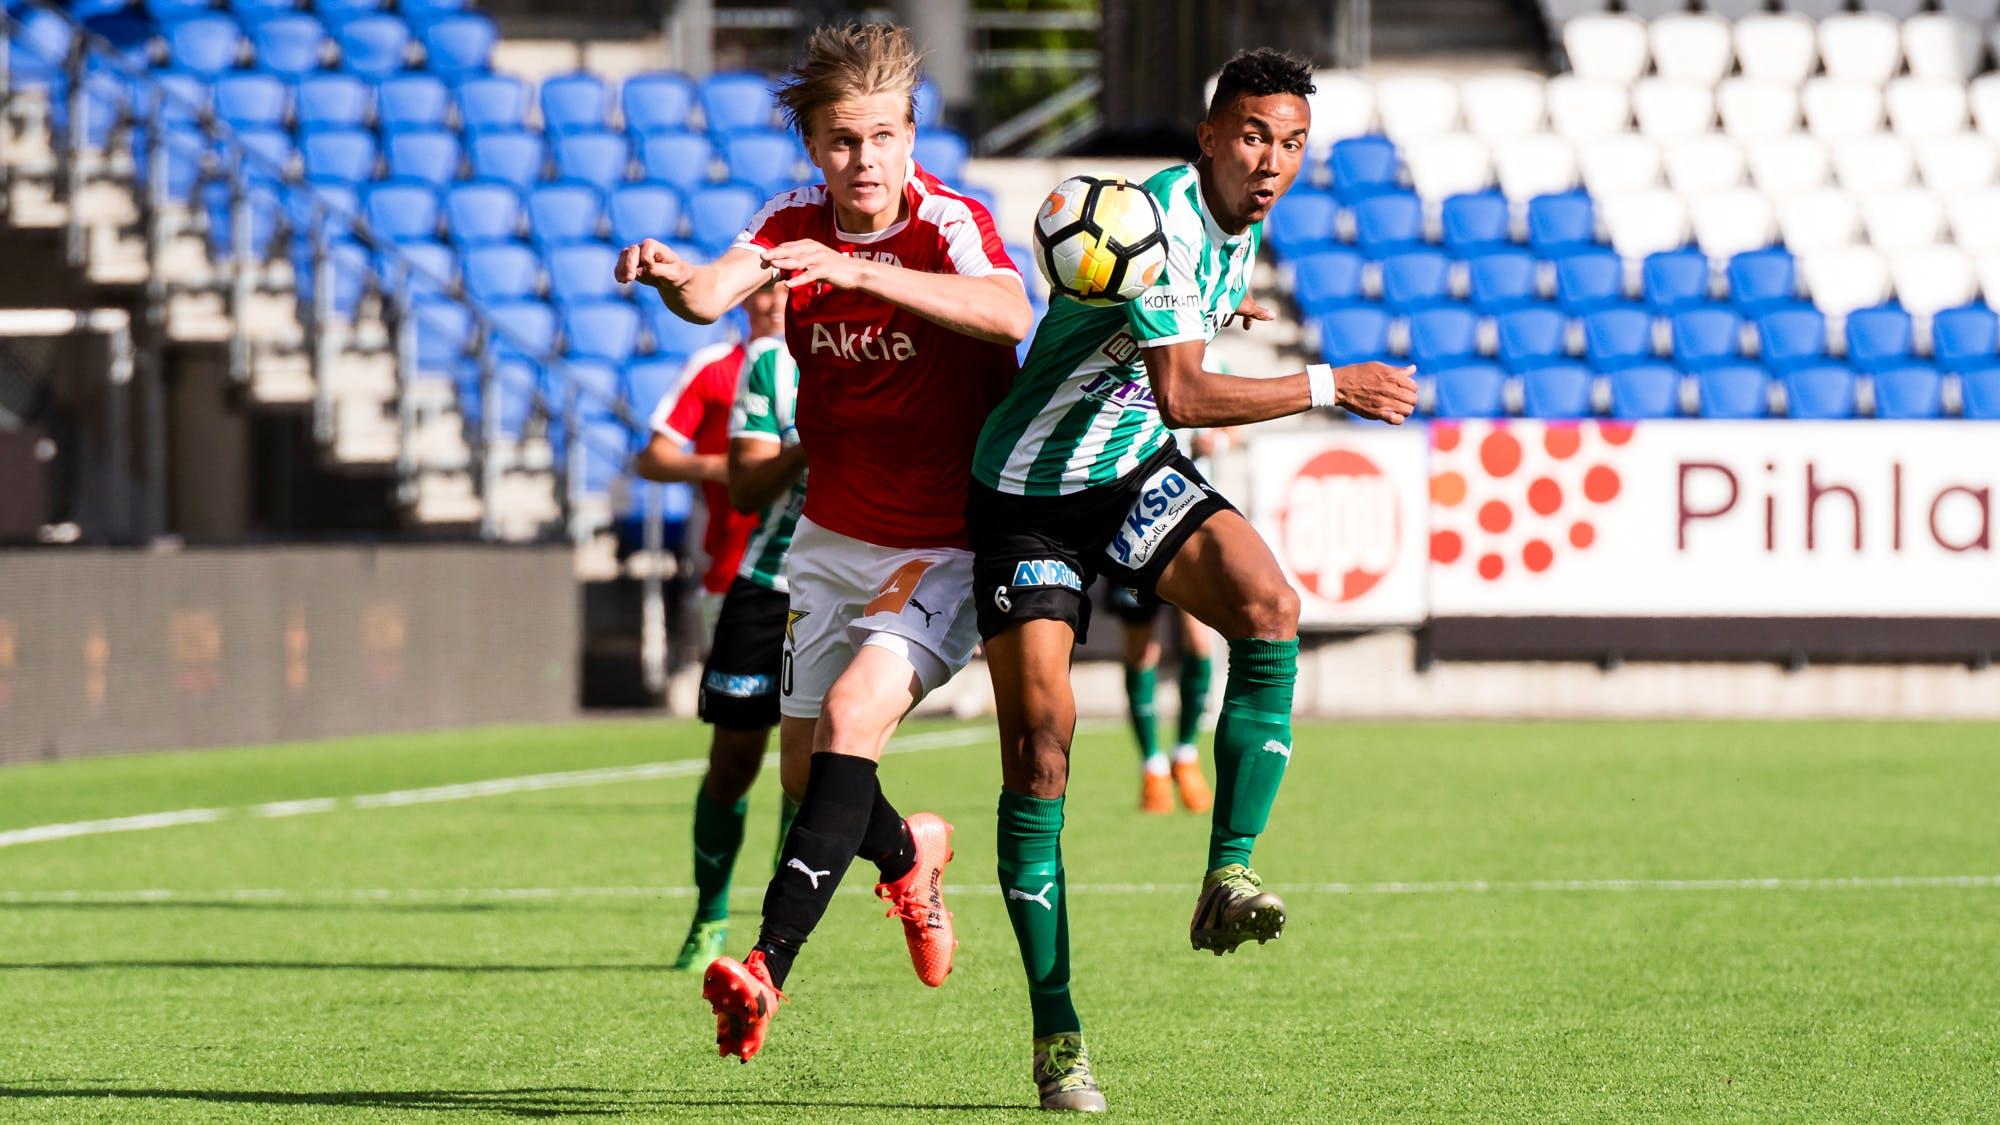 Otteluraportti: HIFK – FC KTP 1-1 (1-1)